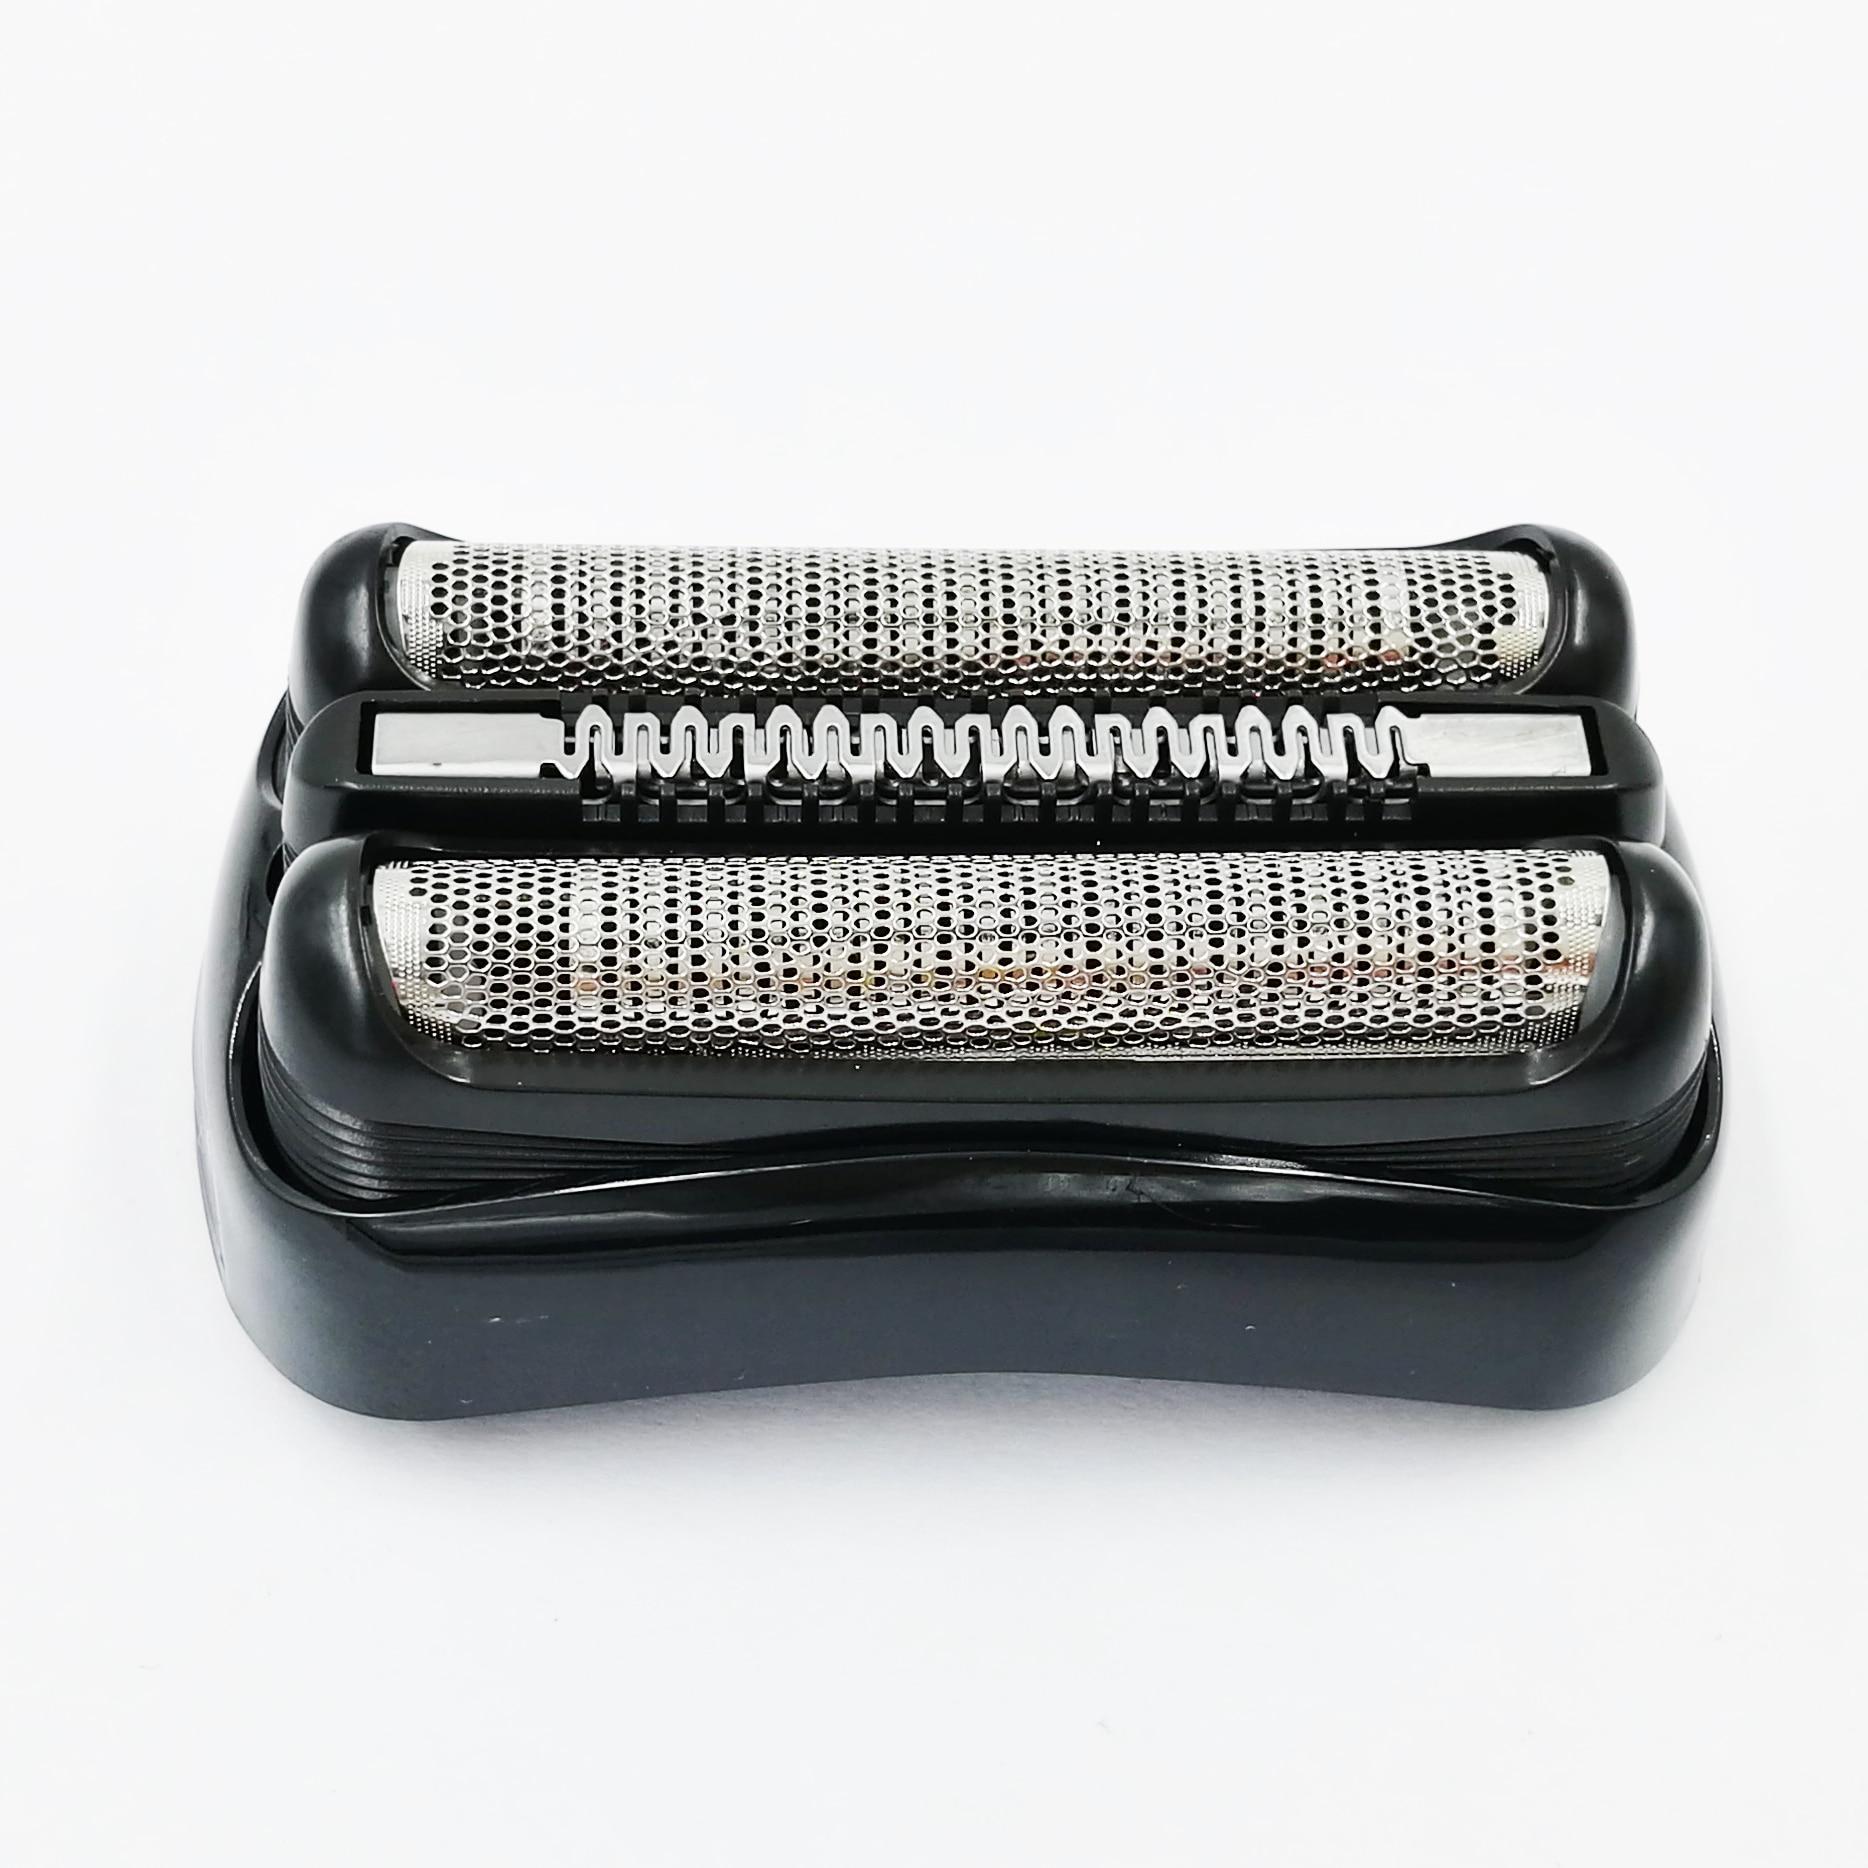 For BRAUN Series 3 Foil & Cutter Head 21B Cassette 320S-4 330S-4 340S-4 3010S 32B 350 380 390CC 350cc 300s 310s Shaver razor